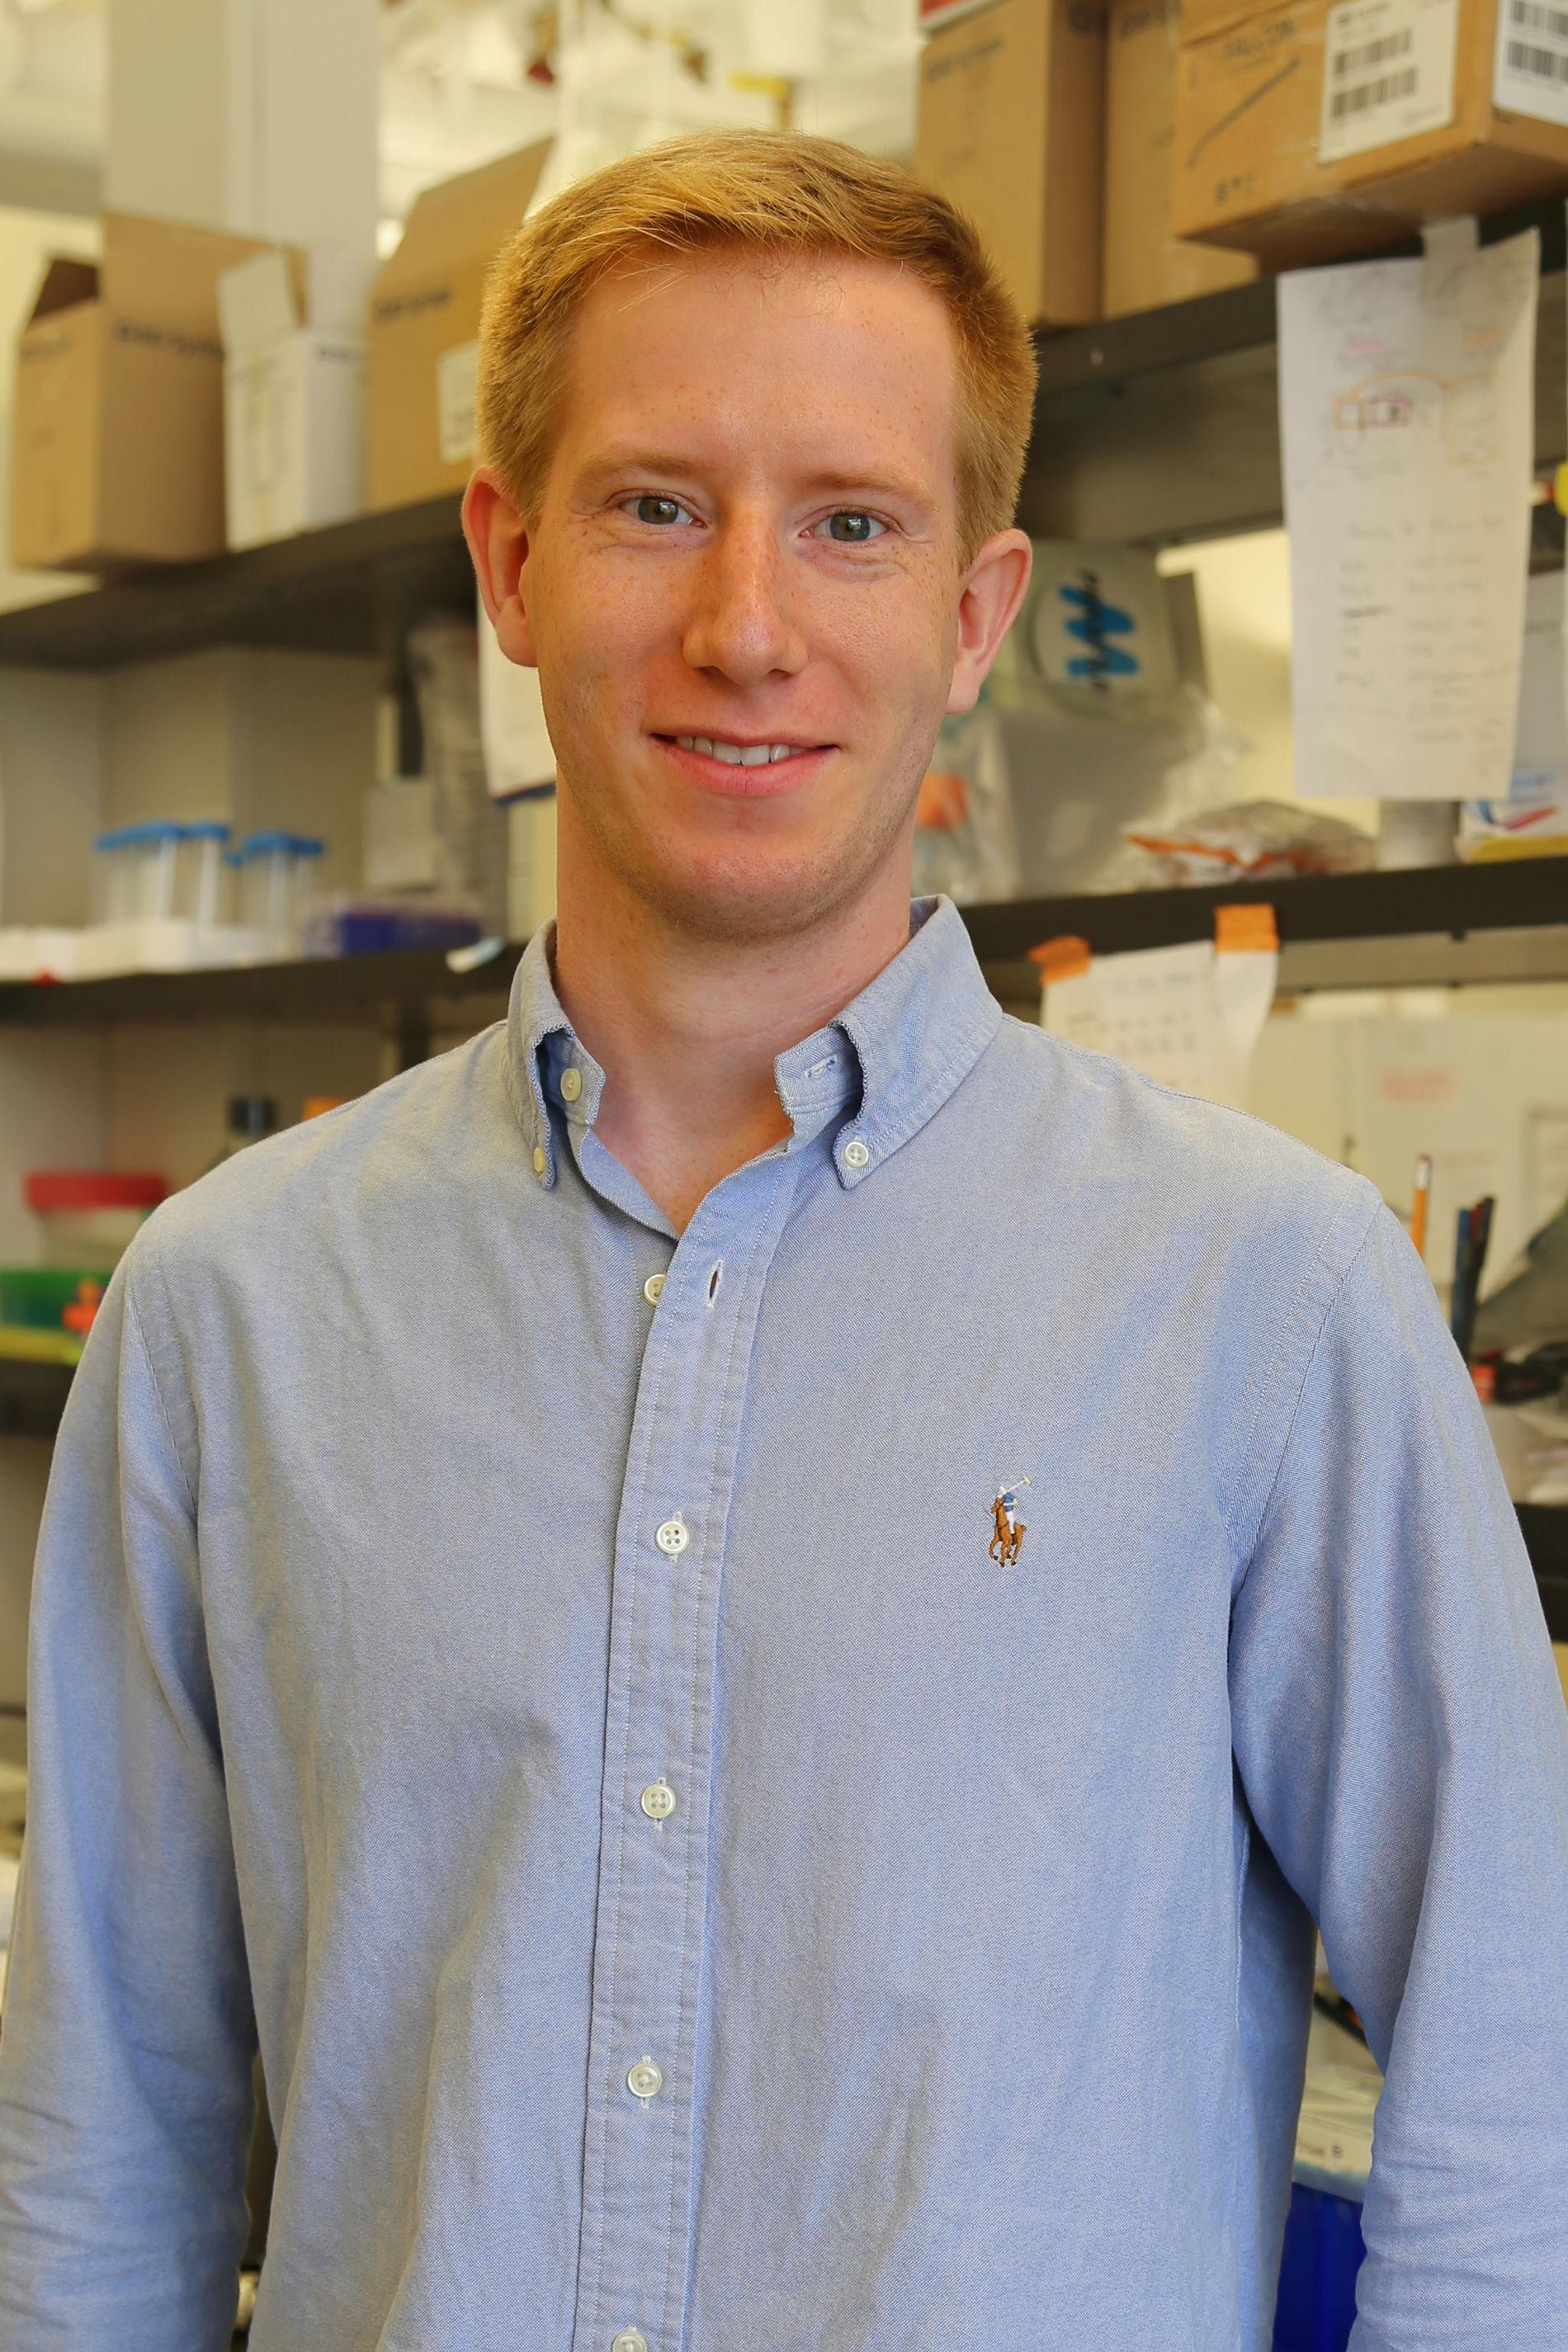 Jonathan Chabon - Senior Research Technician